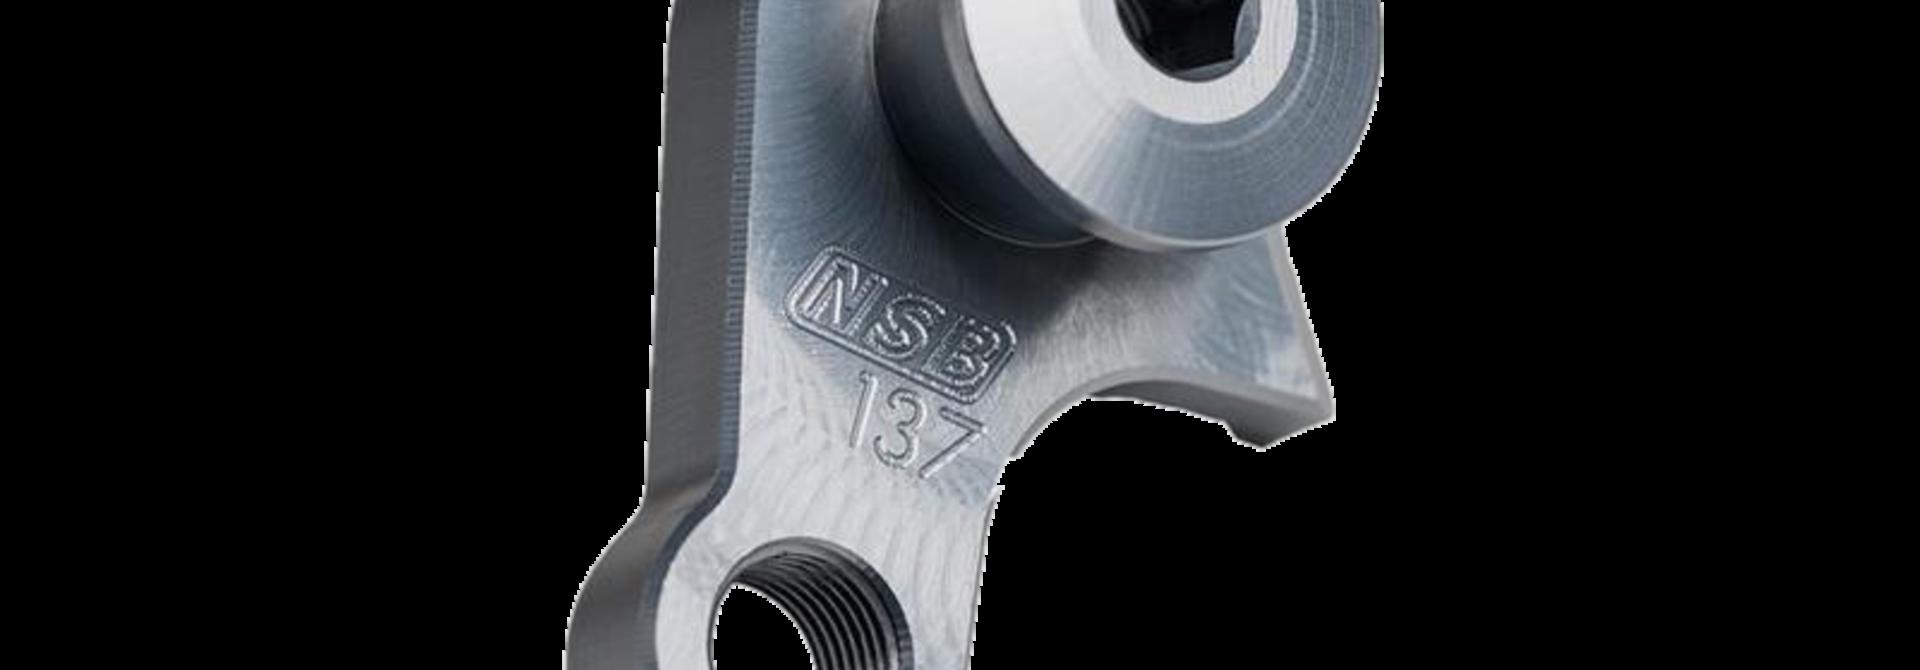 NSB Santa Cruz 12 x 148mm Derailleur Hanger V2